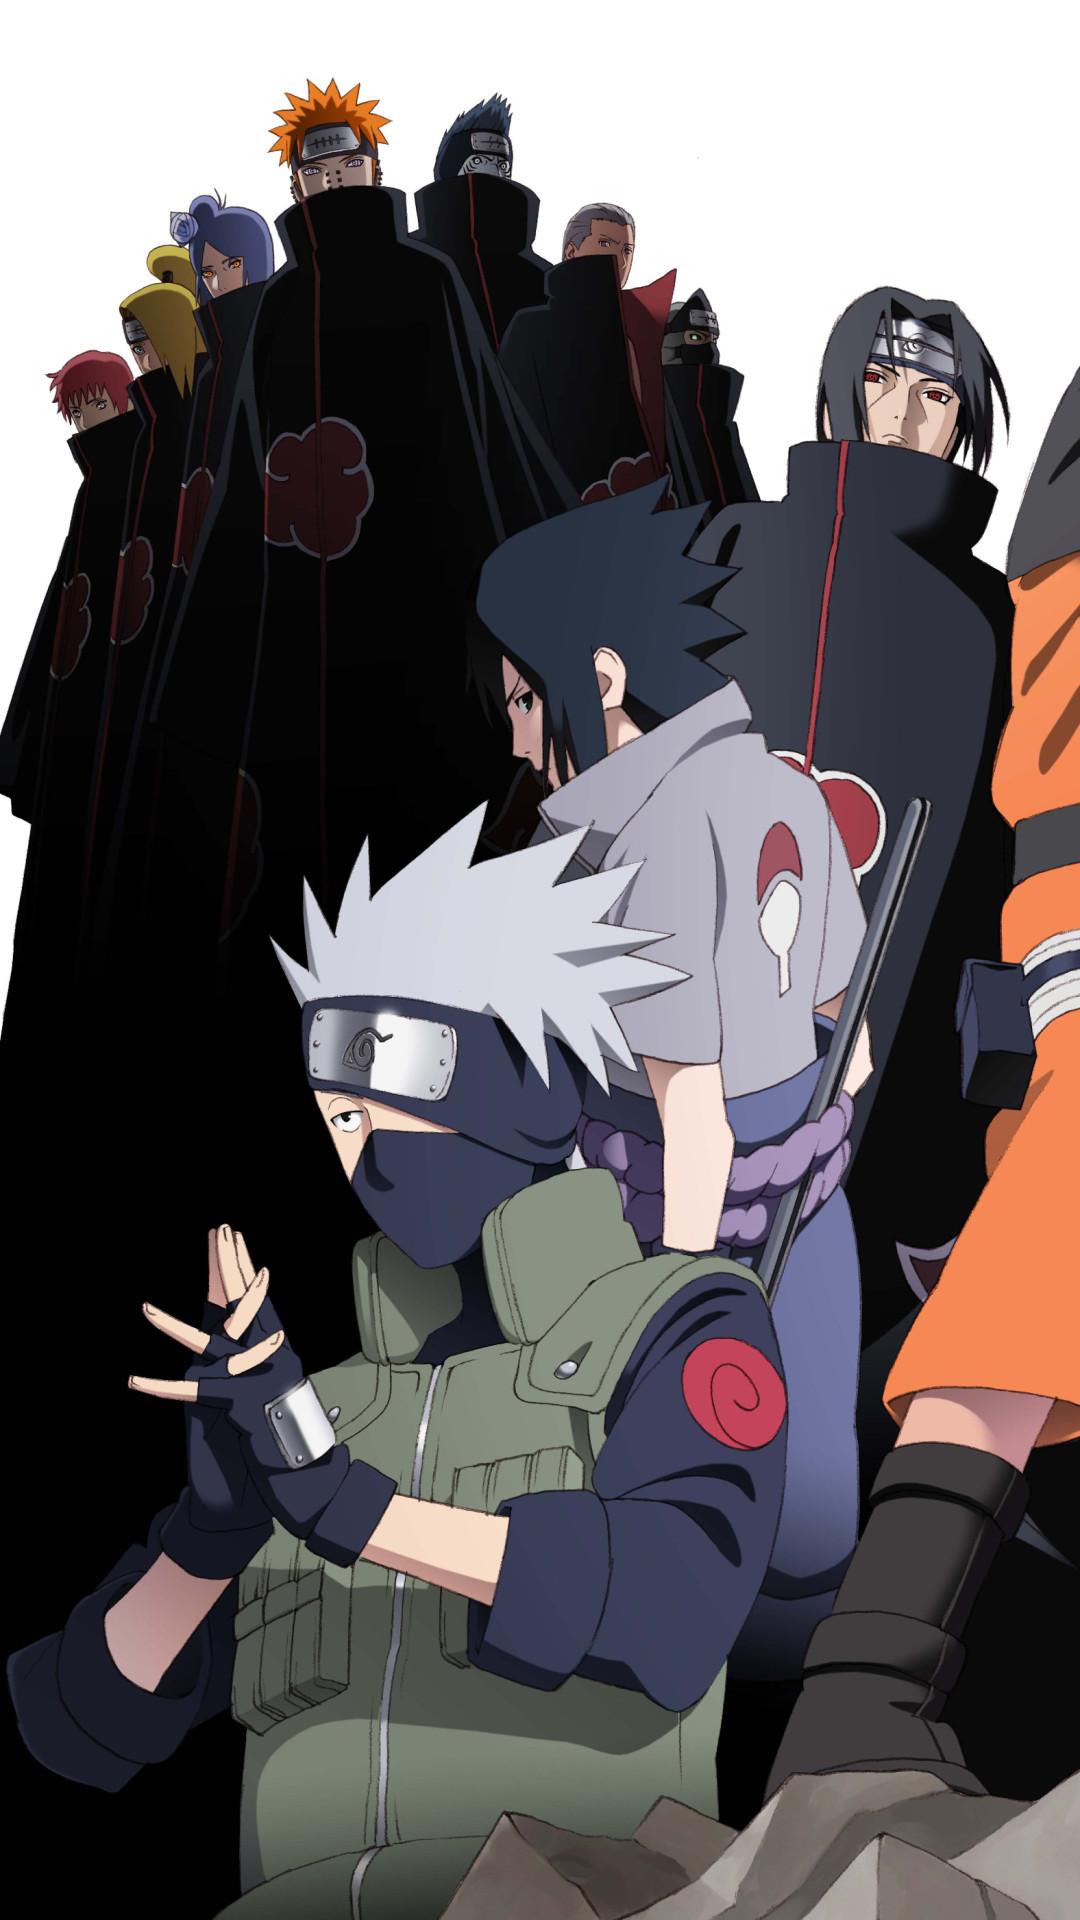 Res: 1080x1920, Anime / Naruto () Mobile Wallpaper